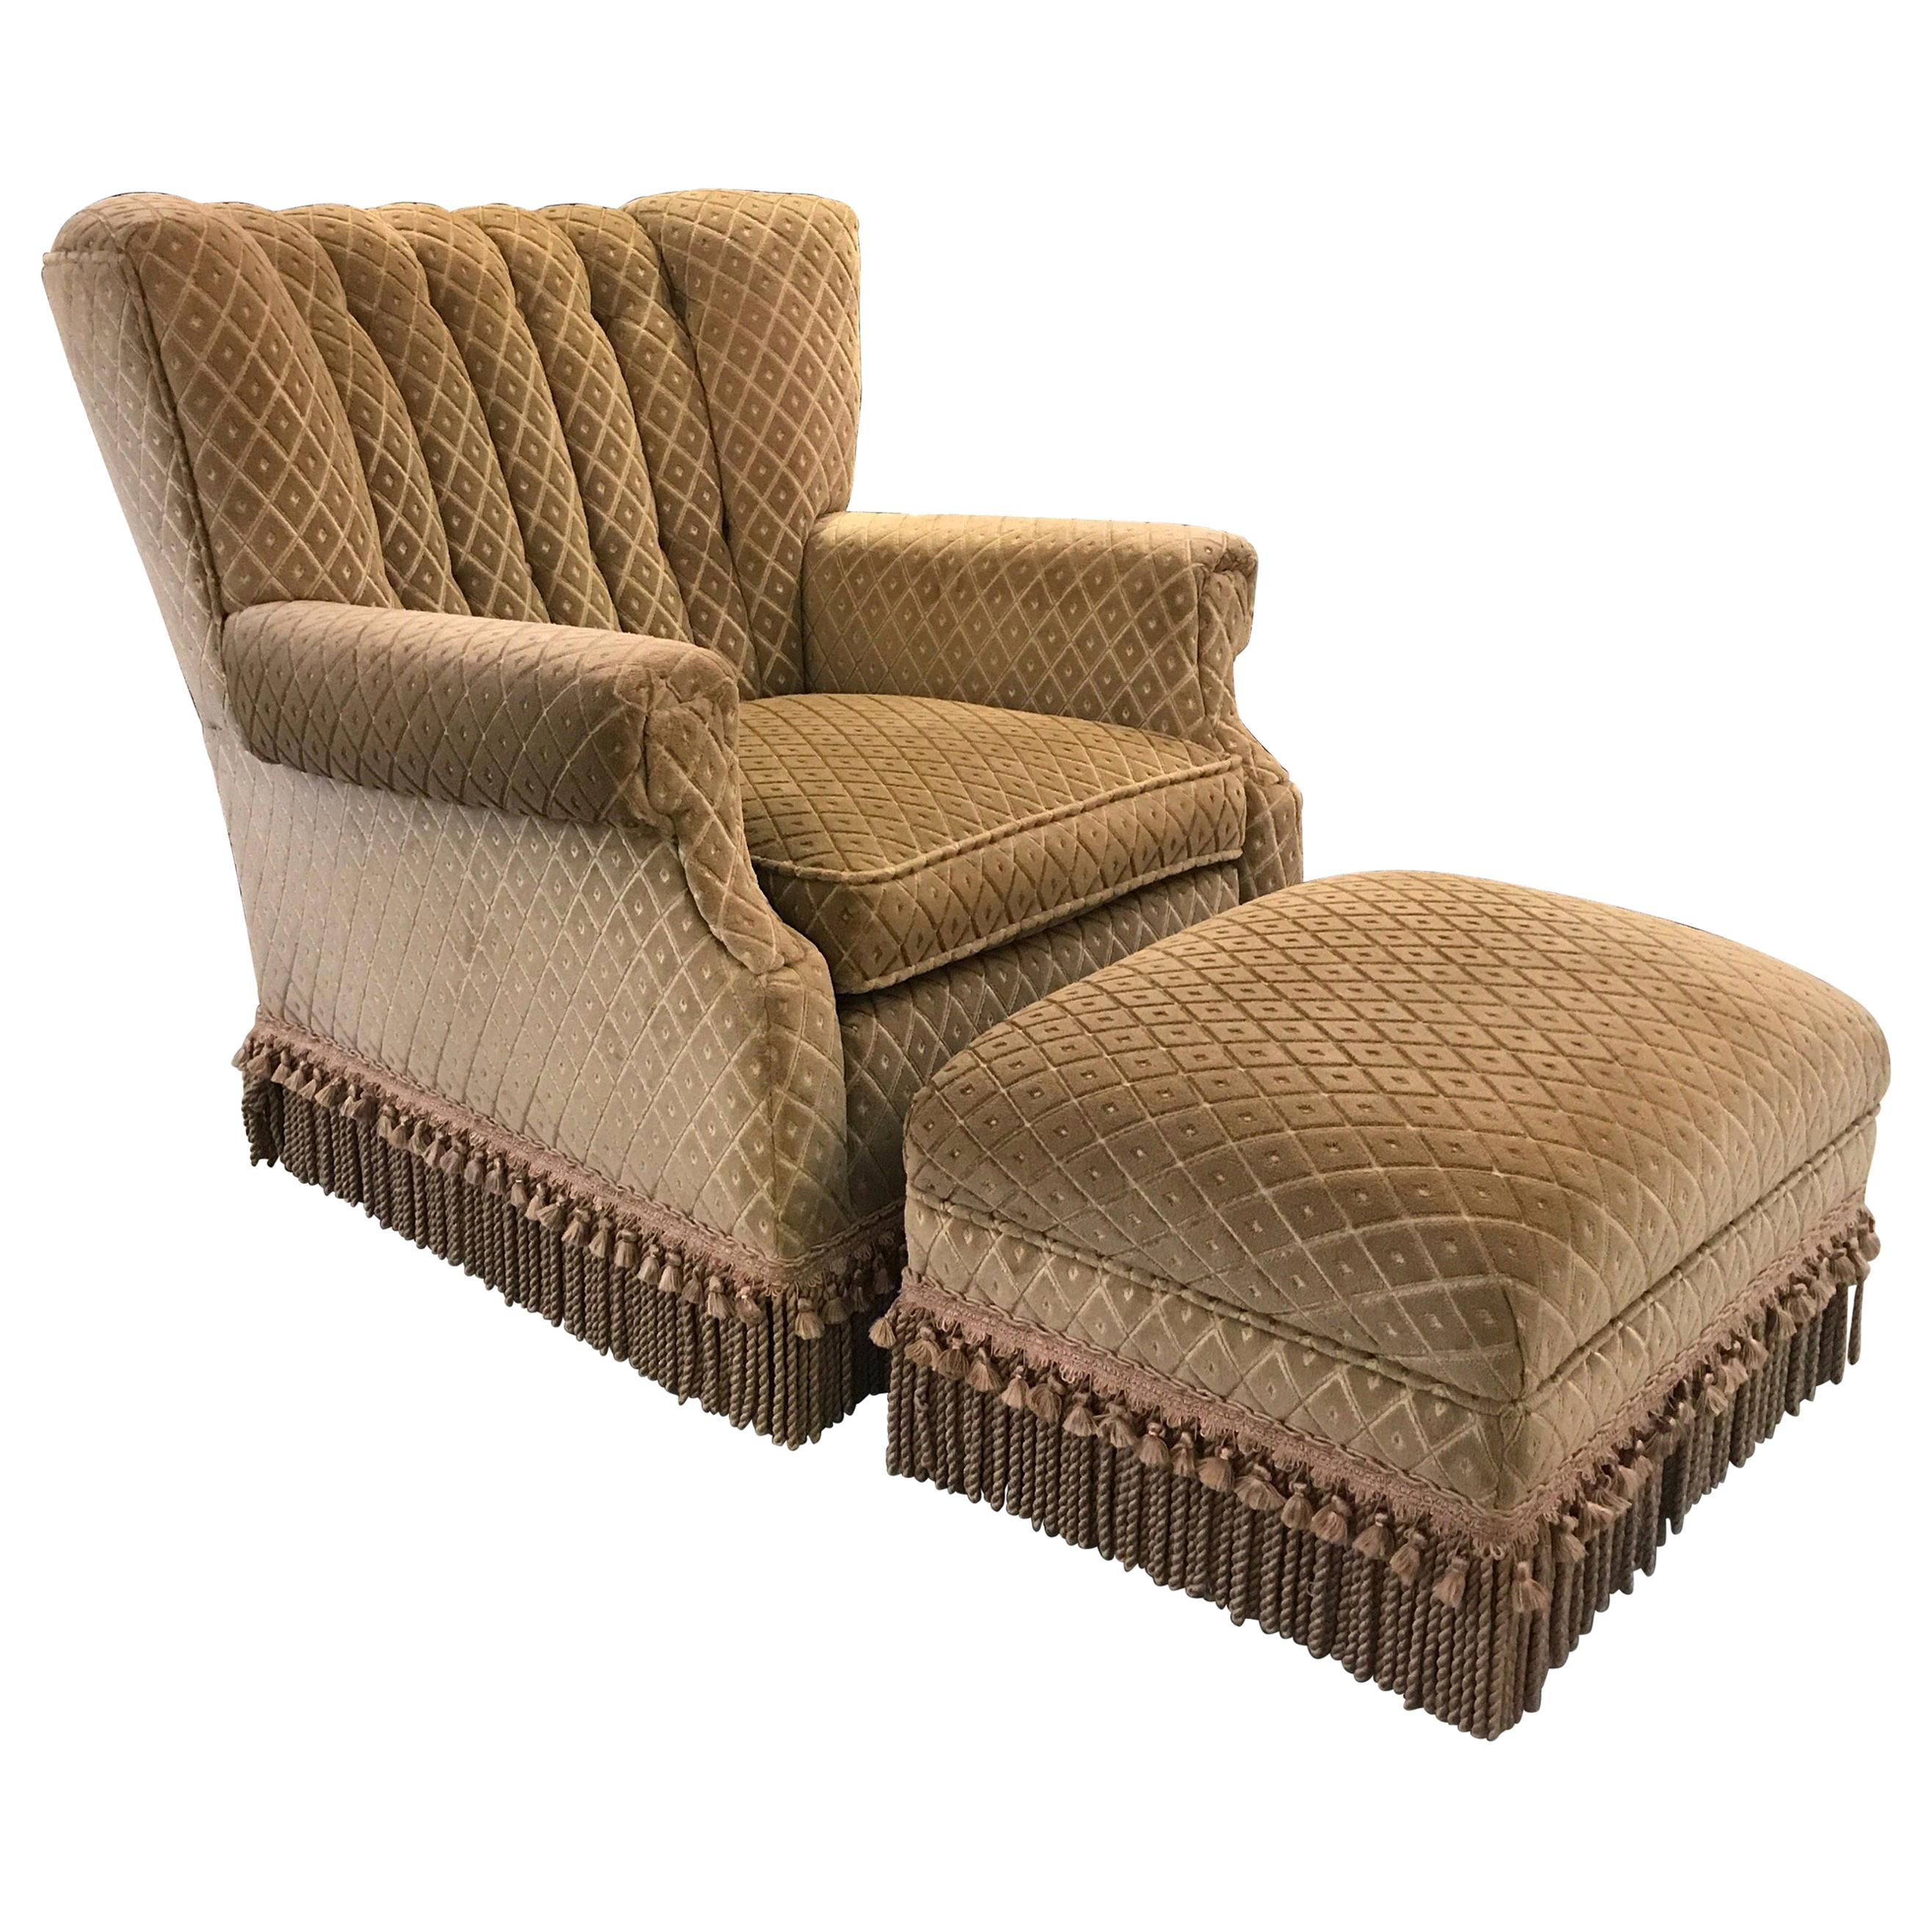 Decorator Club Chair and Ottoman by Swaim